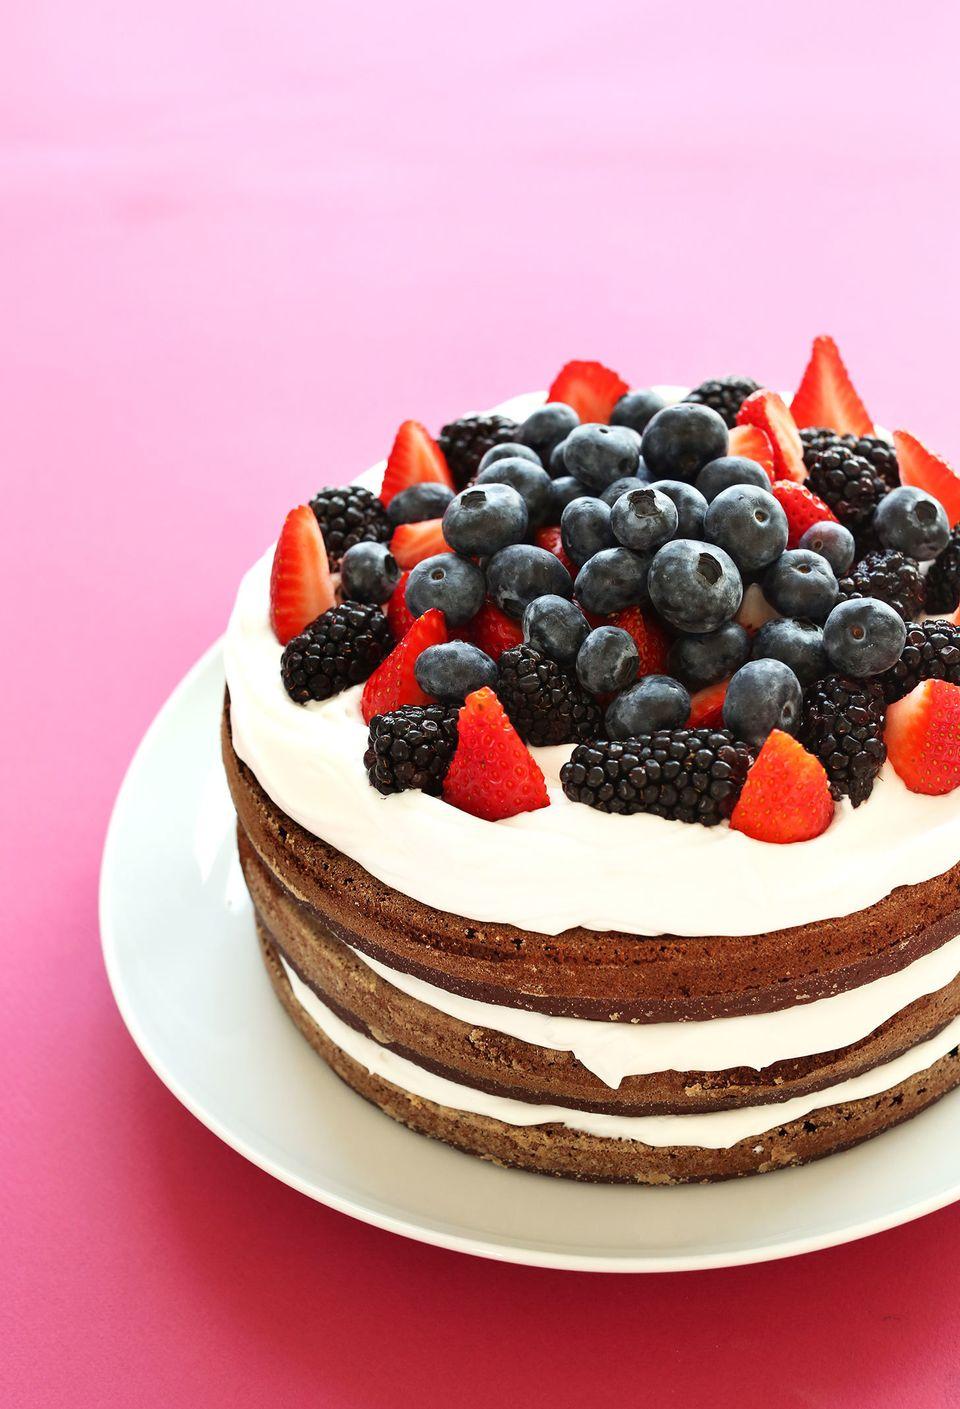 Awe Inspiring The Gluten Free Birthday Cake Recipes Your Celebration Needs Funny Birthday Cards Online Inifofree Goldxyz